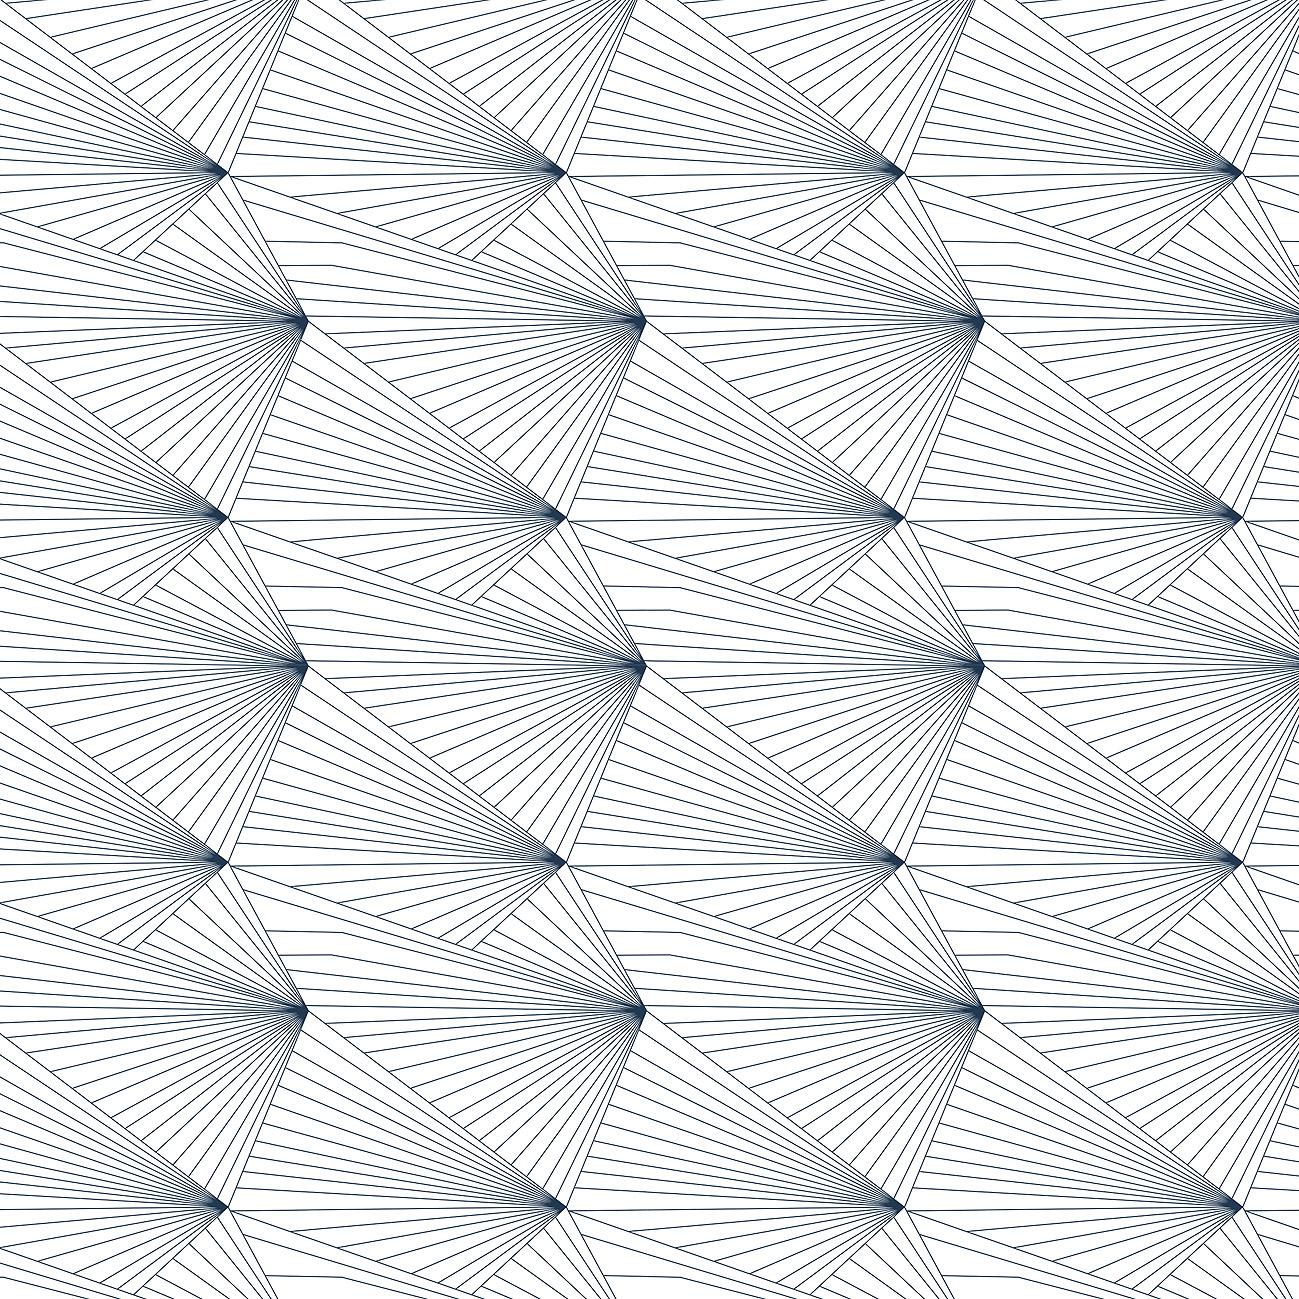 Erica Wakerly Fan navywhite Wallpaper 1299x1299